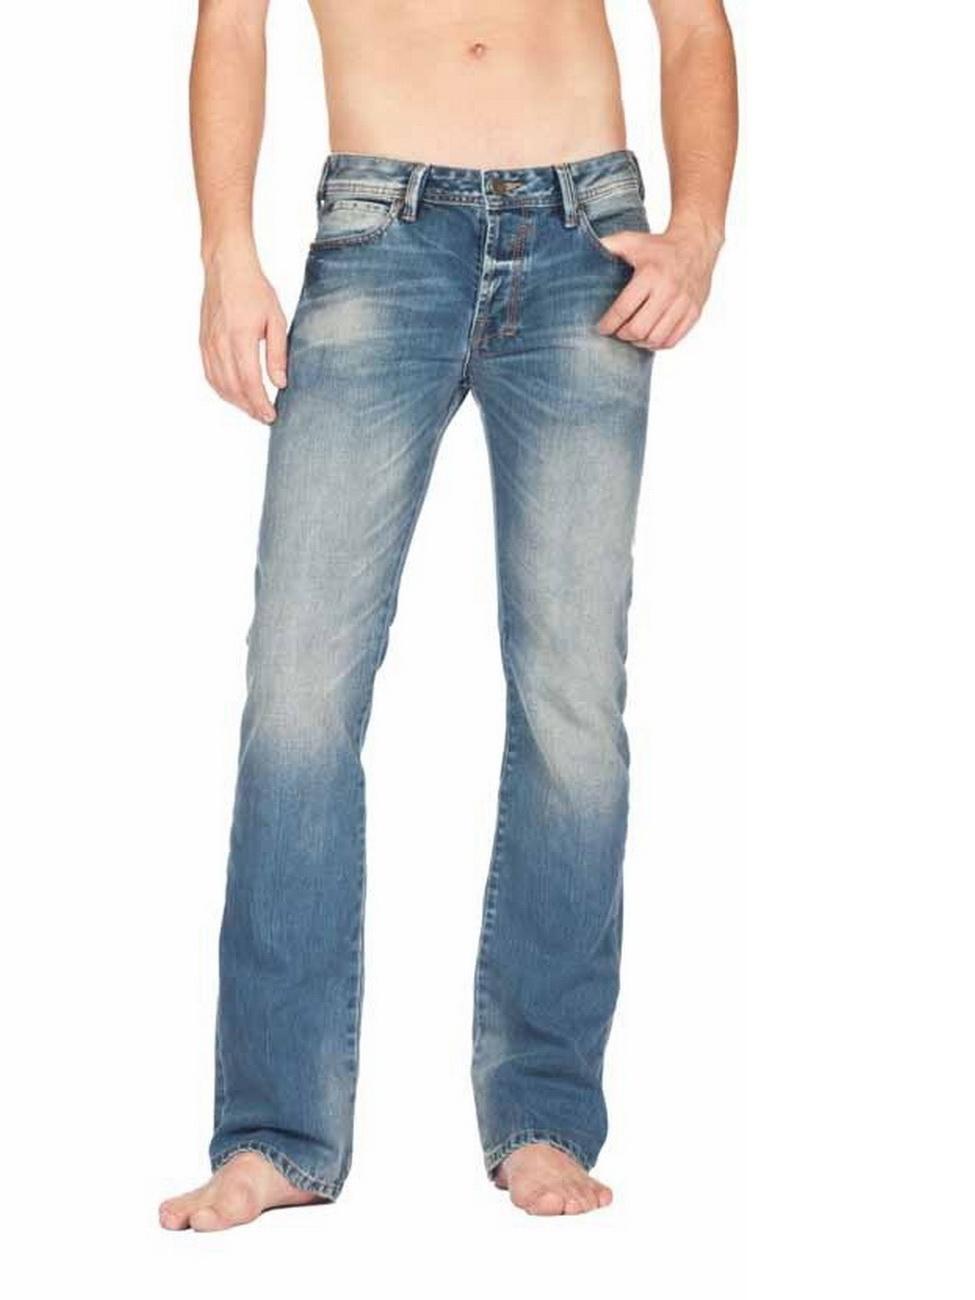 ltb herren jeans roden bootcut powder aged kaufen. Black Bedroom Furniture Sets. Home Design Ideas